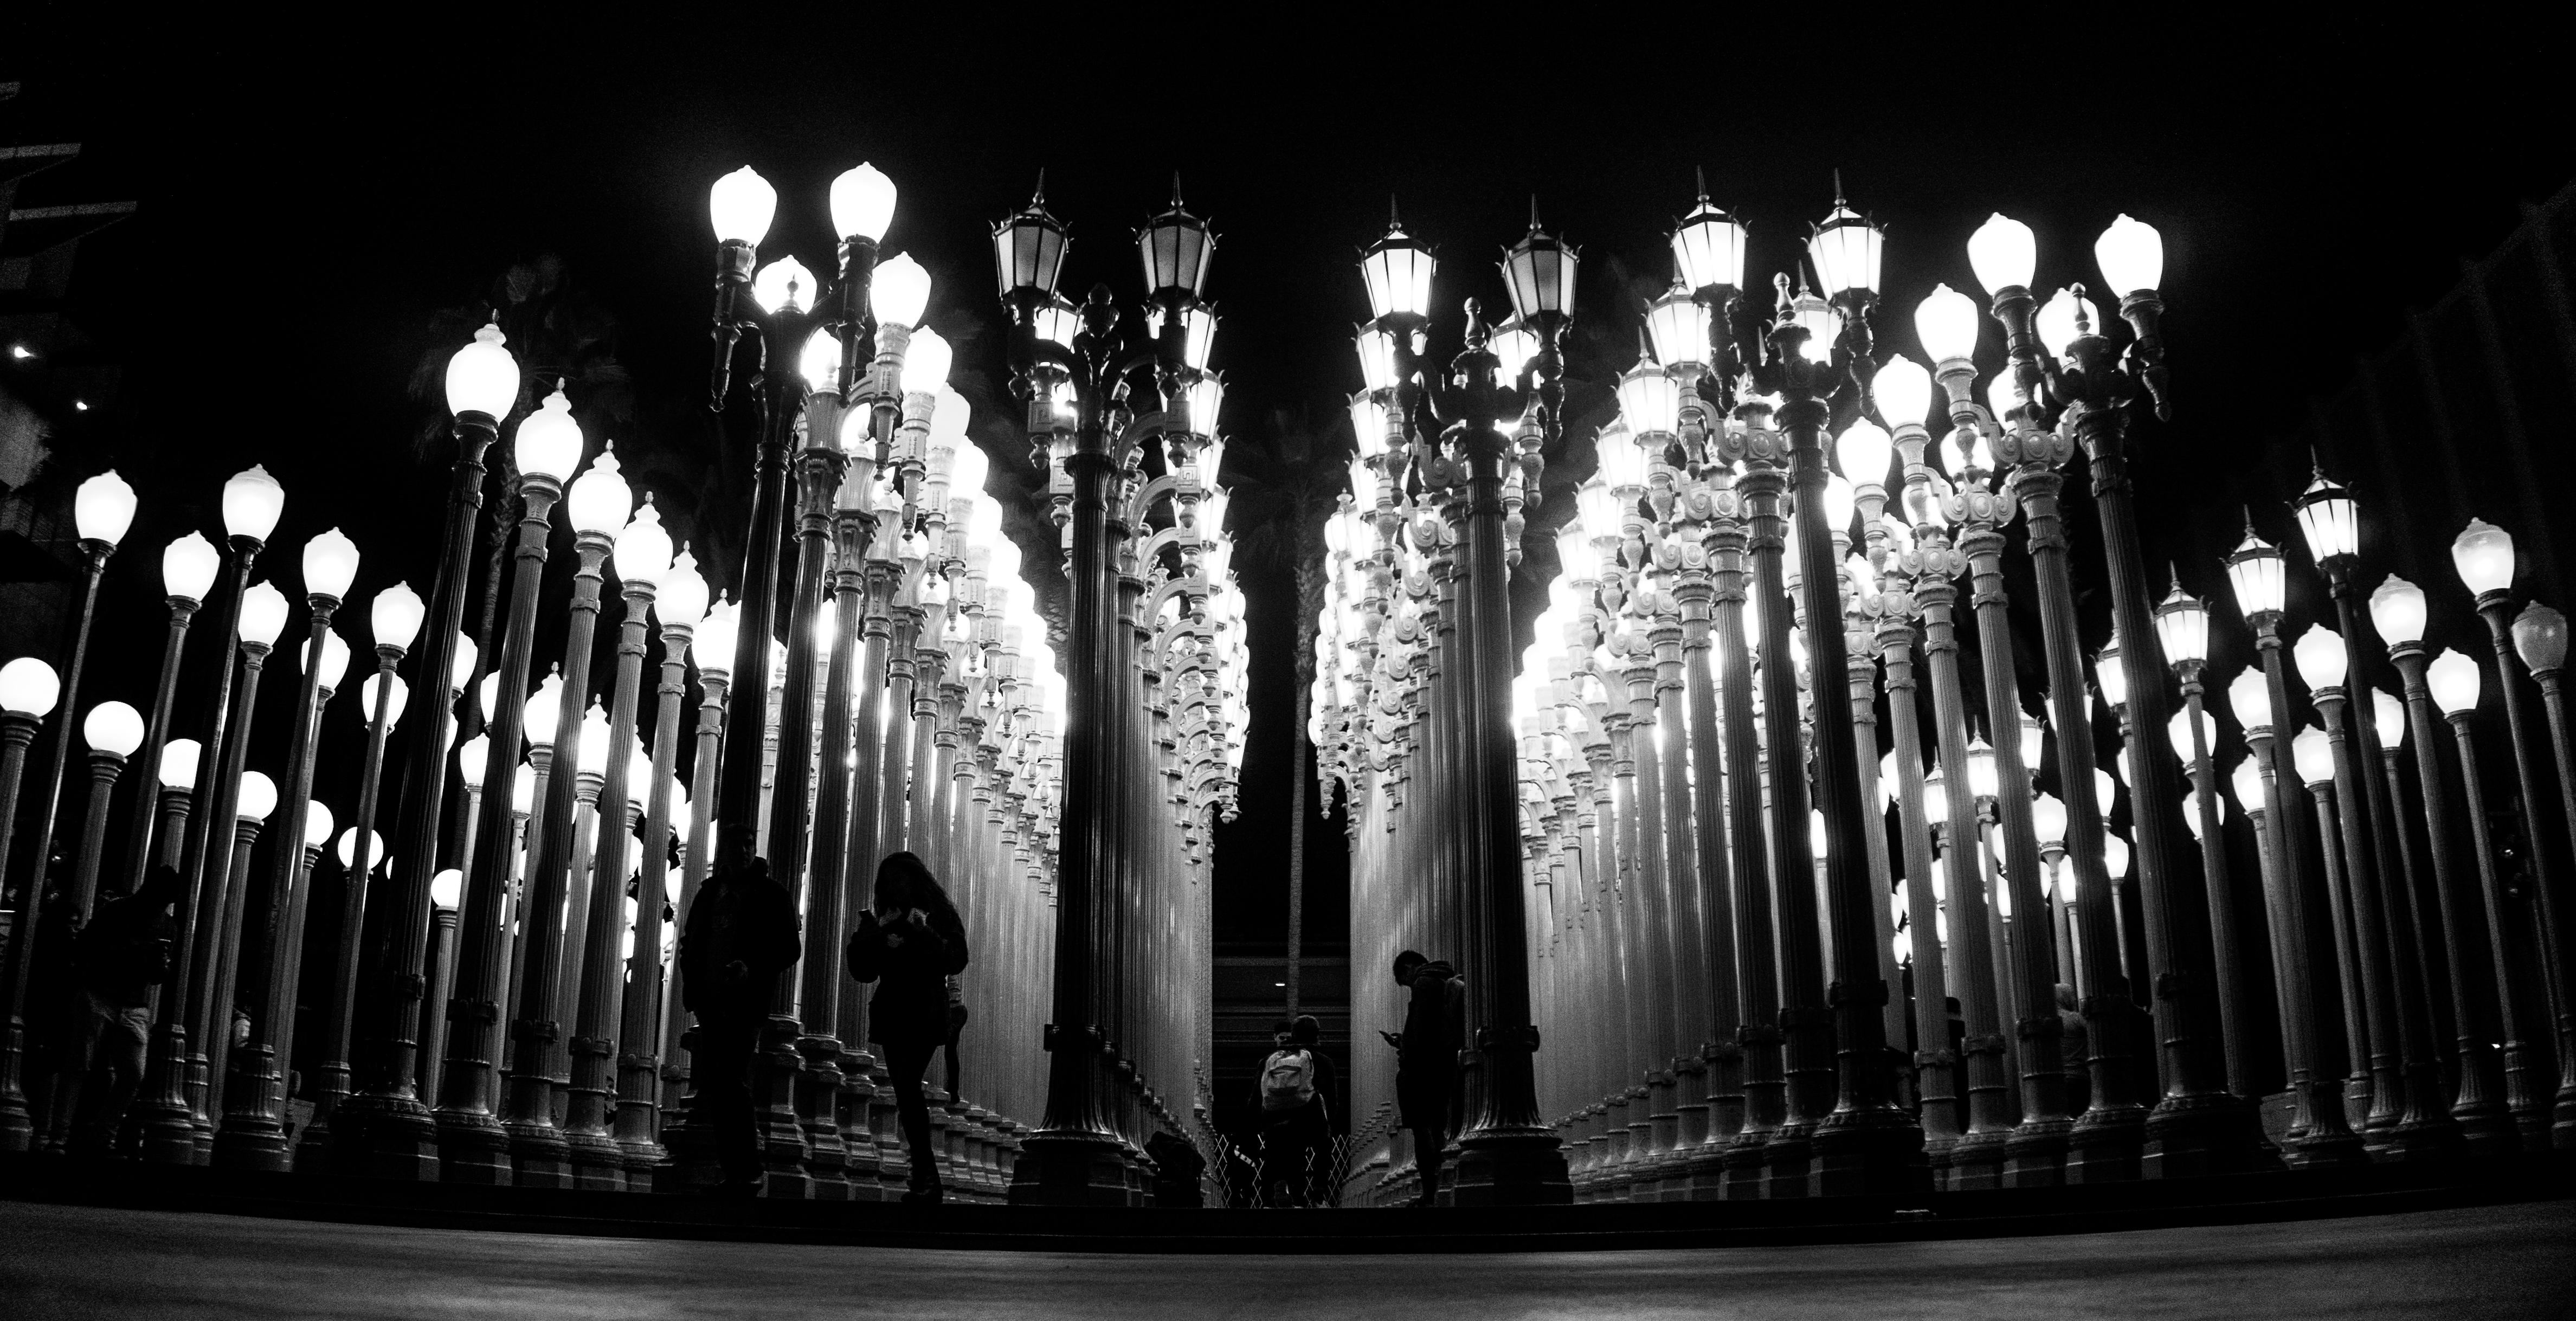 A night @ lacma photo